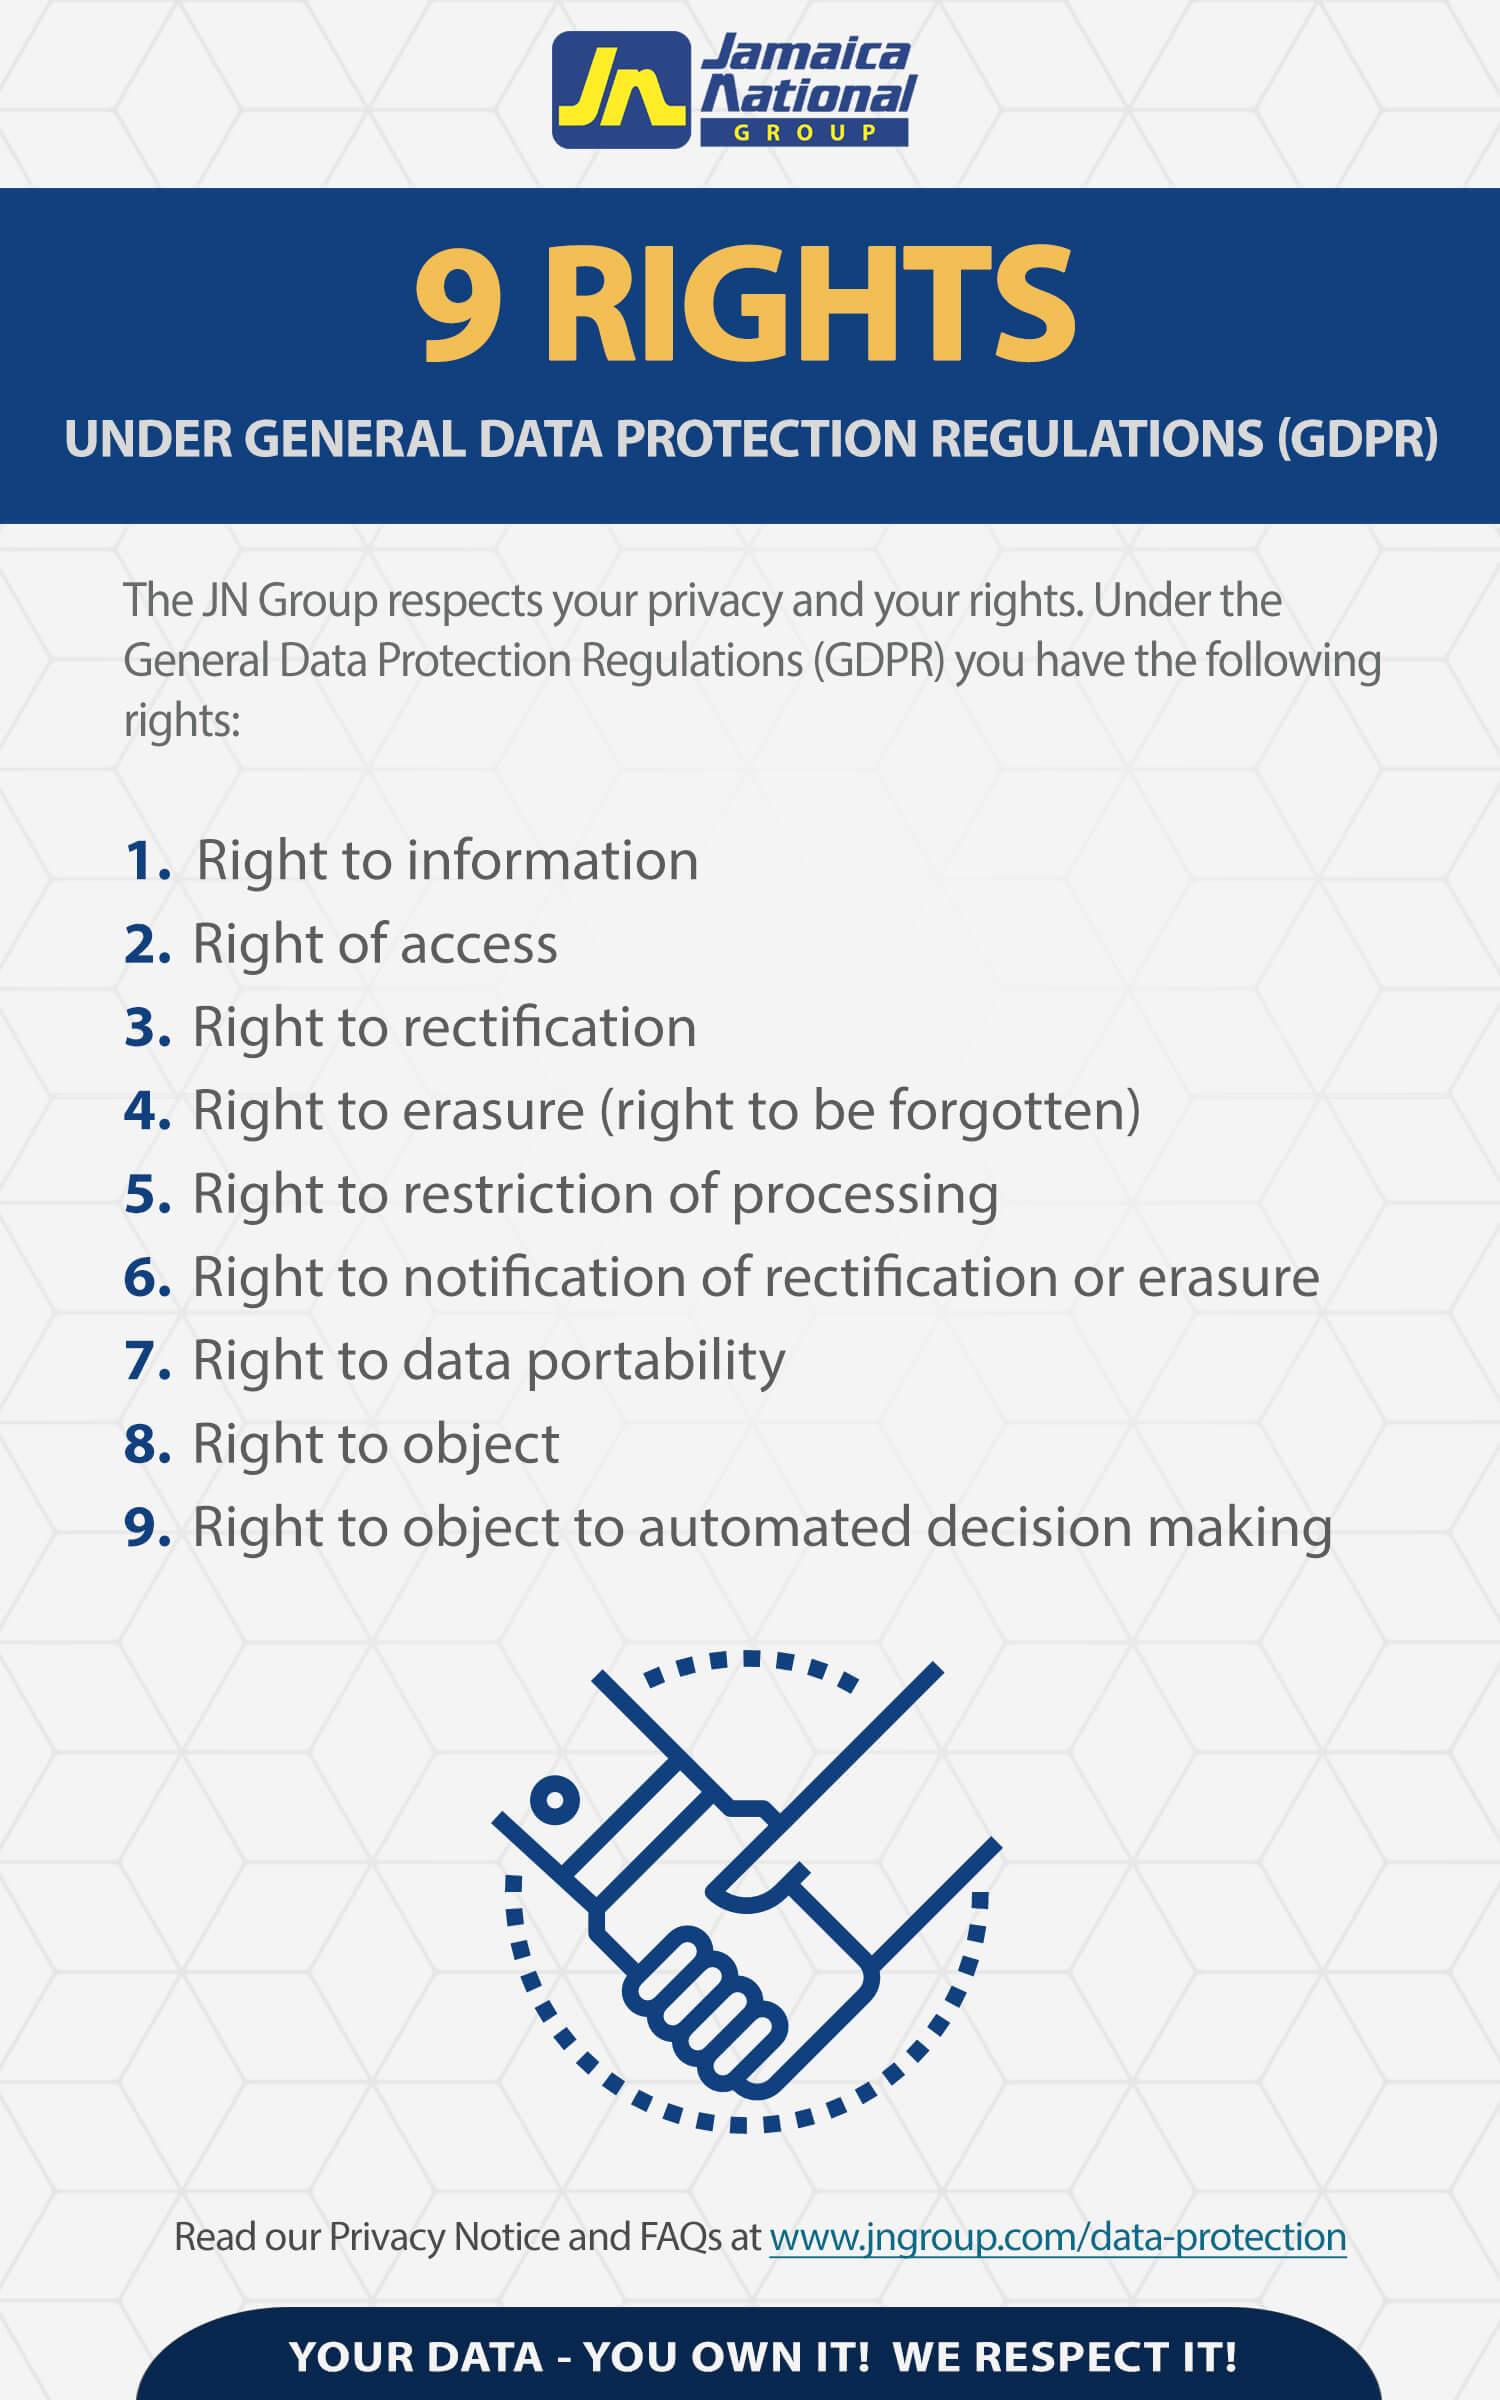 9 Rights GDPR